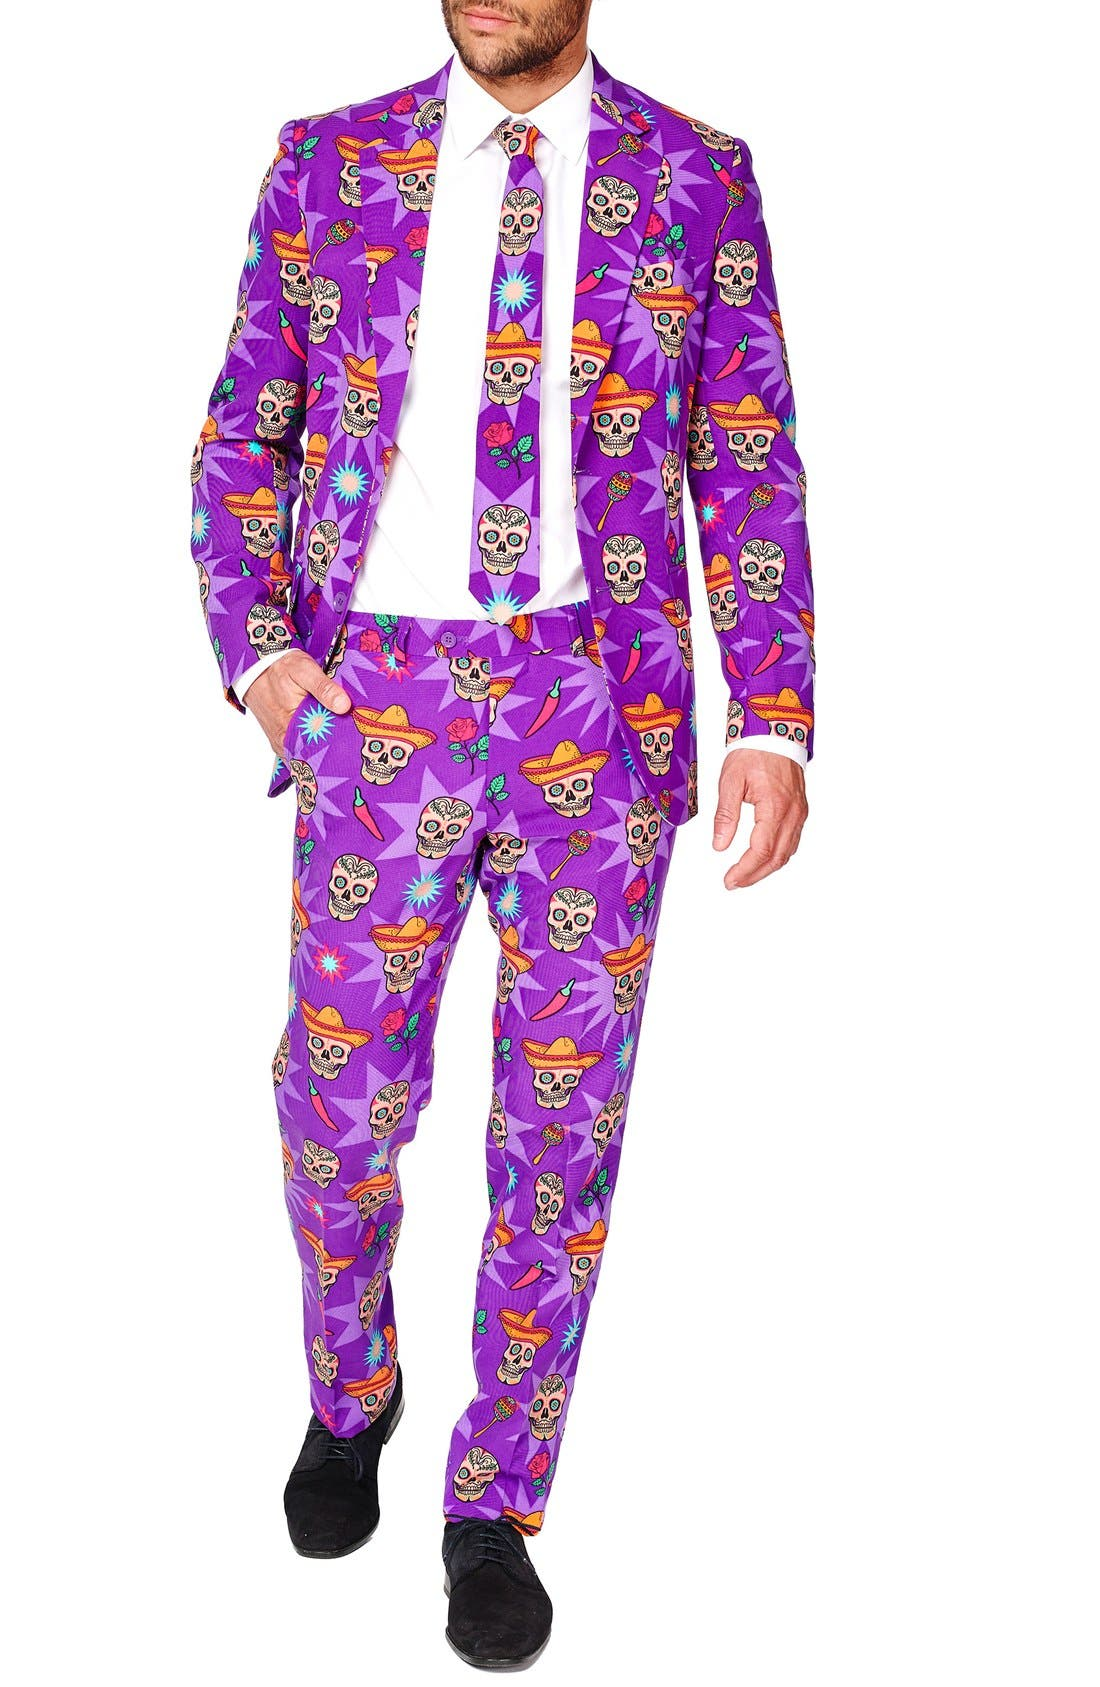 OppoSuits 'El Muerto' Trim Fit Two-Piece Suit with Tie